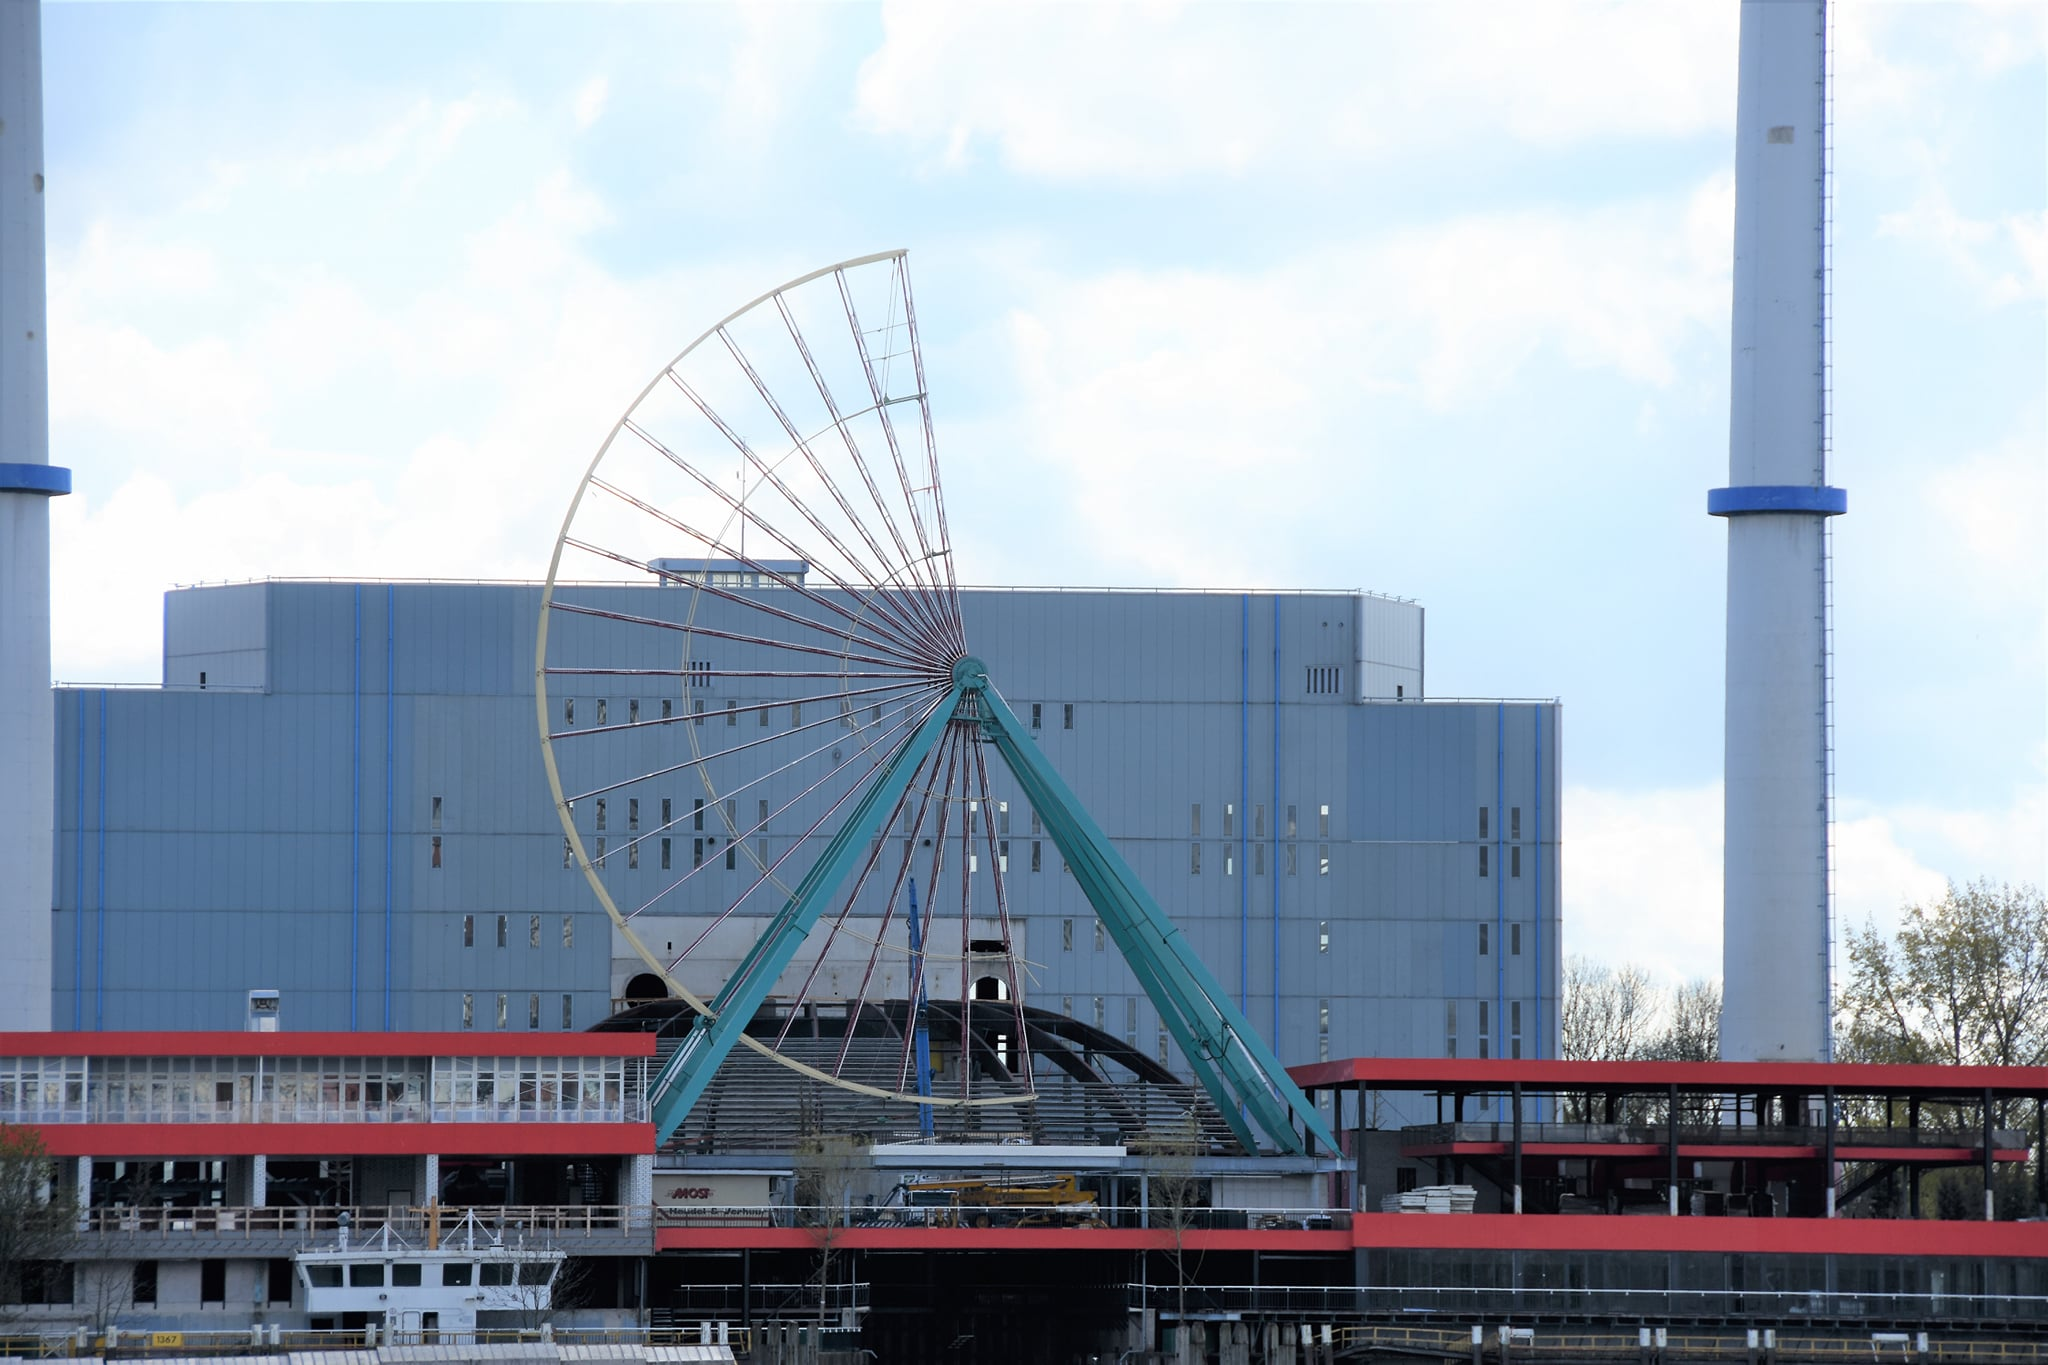 Reuzenrad Speelstad Rotterdam FOTO- KEES GRIMM